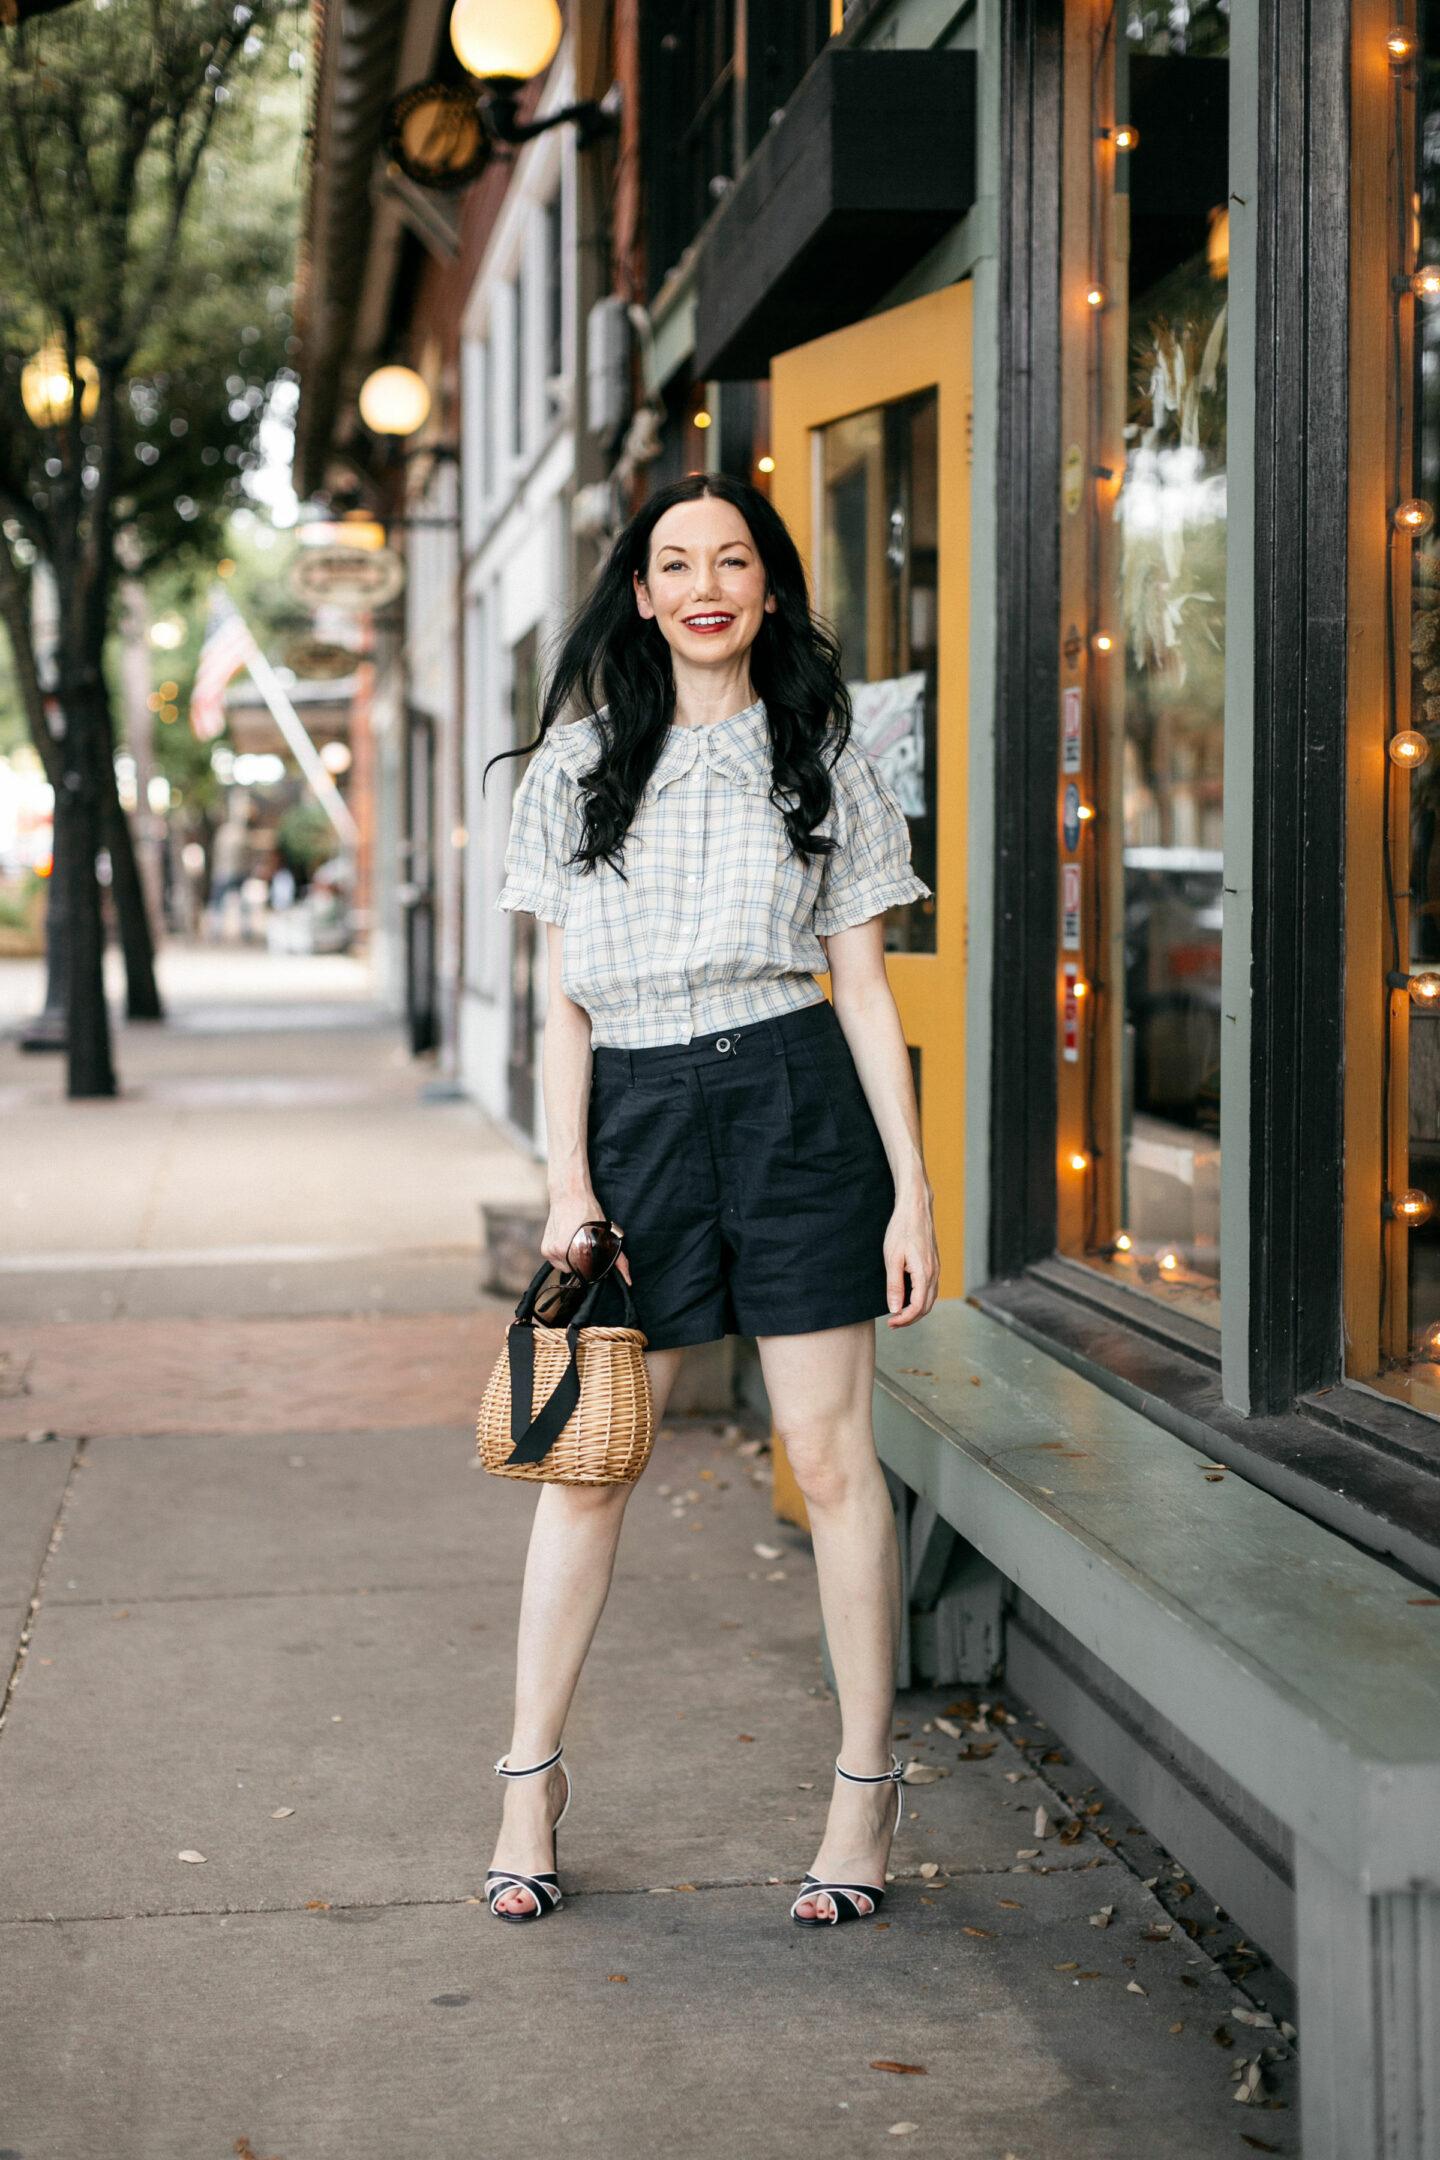 Fall Transitional Look: Doen Shirt and Linen Shorts